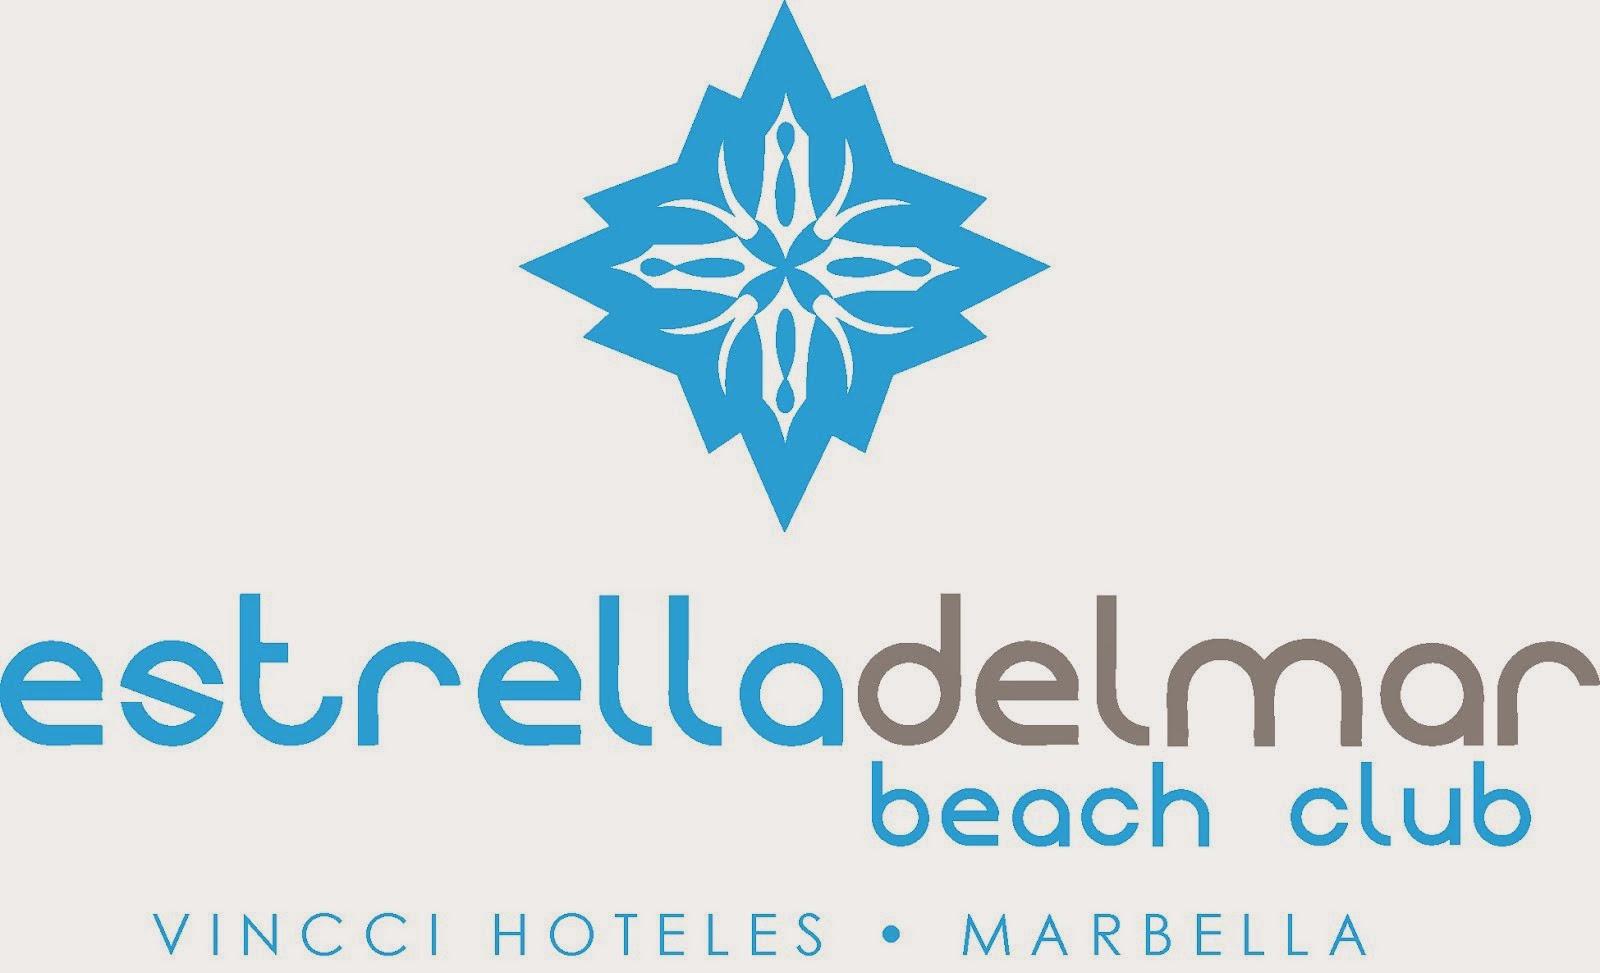 Vincci Hoteles. Marbella